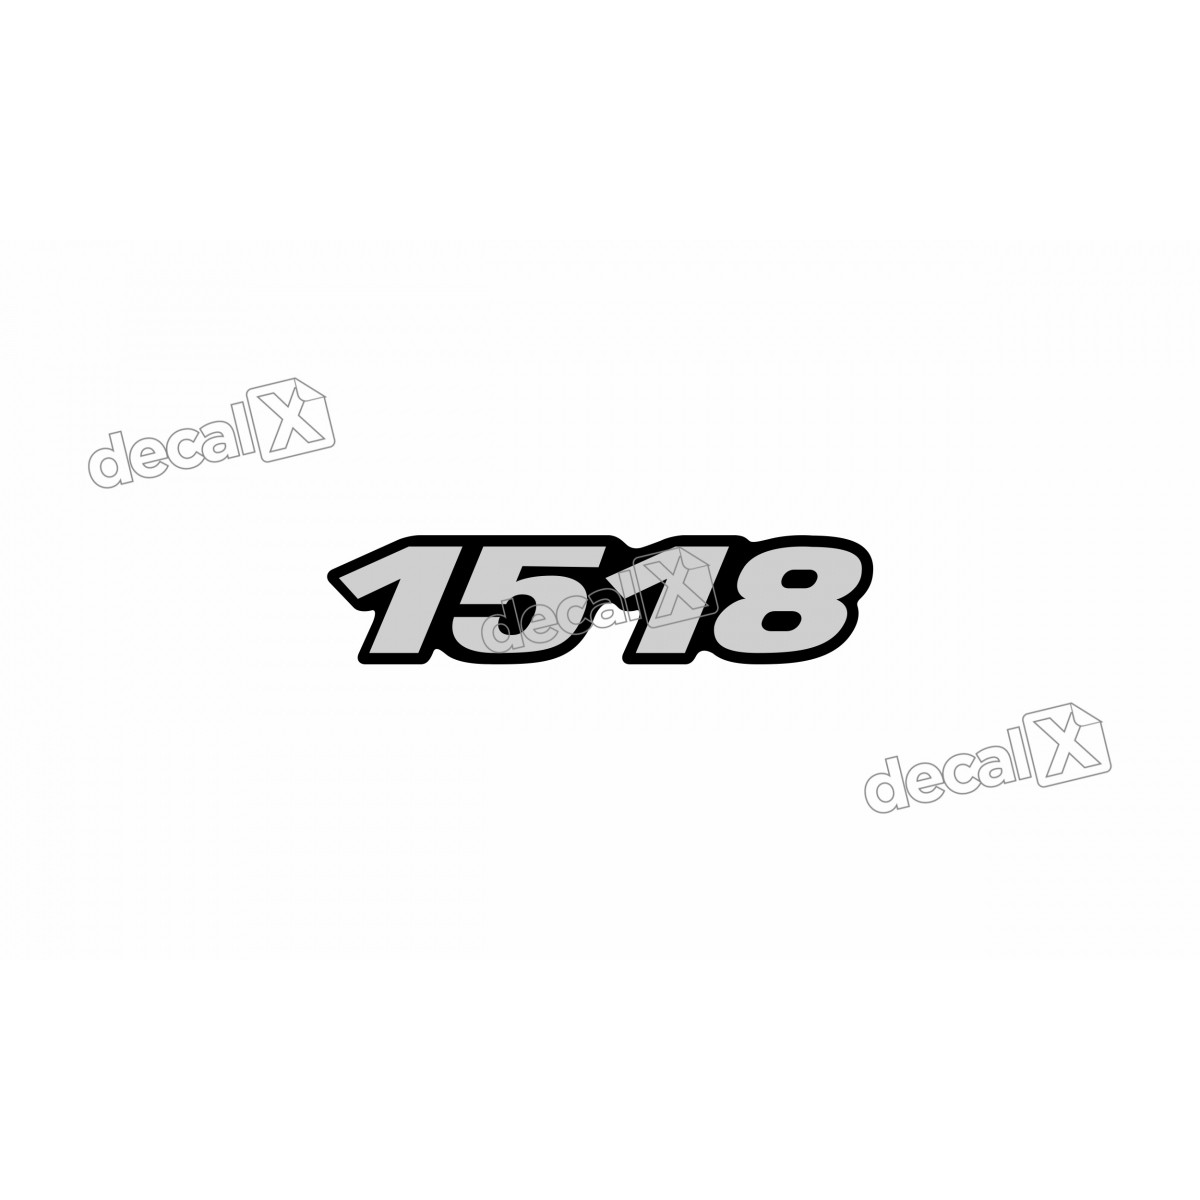 Adesivo Emblema Resinado Mercedes 1518 Cm37 Decalx